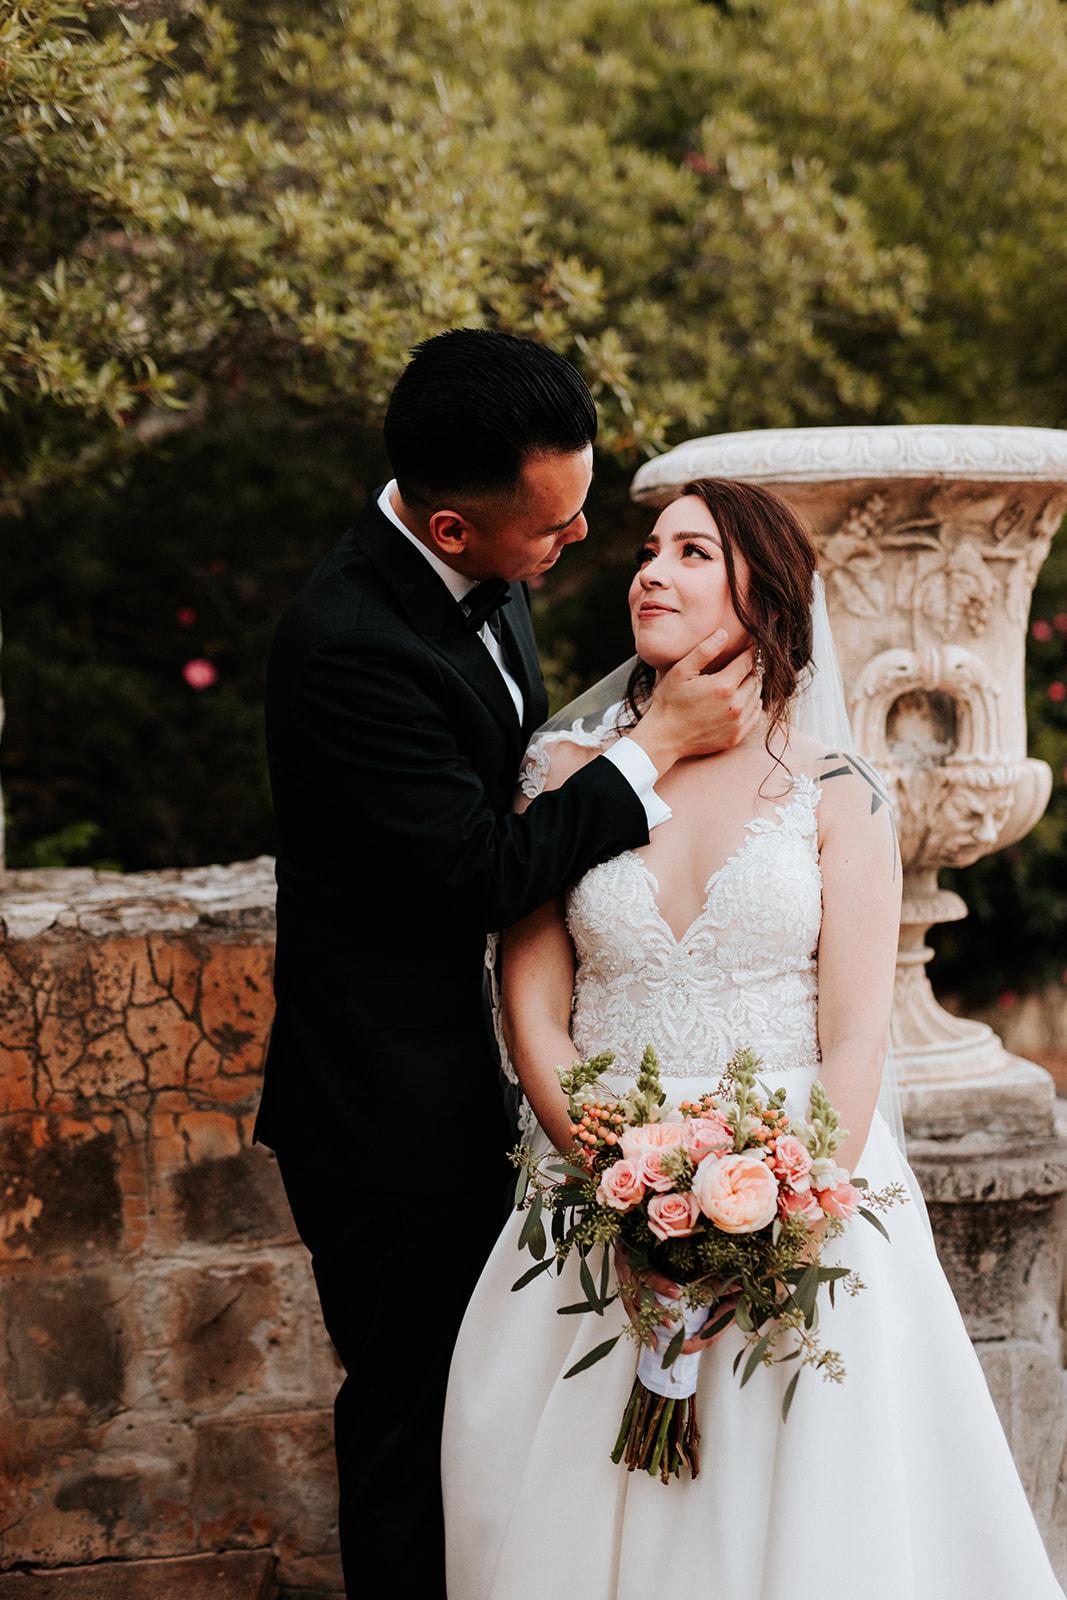 Jessica_+_JD_Wedding_-_Diana_Ascarrunz_Photography-765.jpg